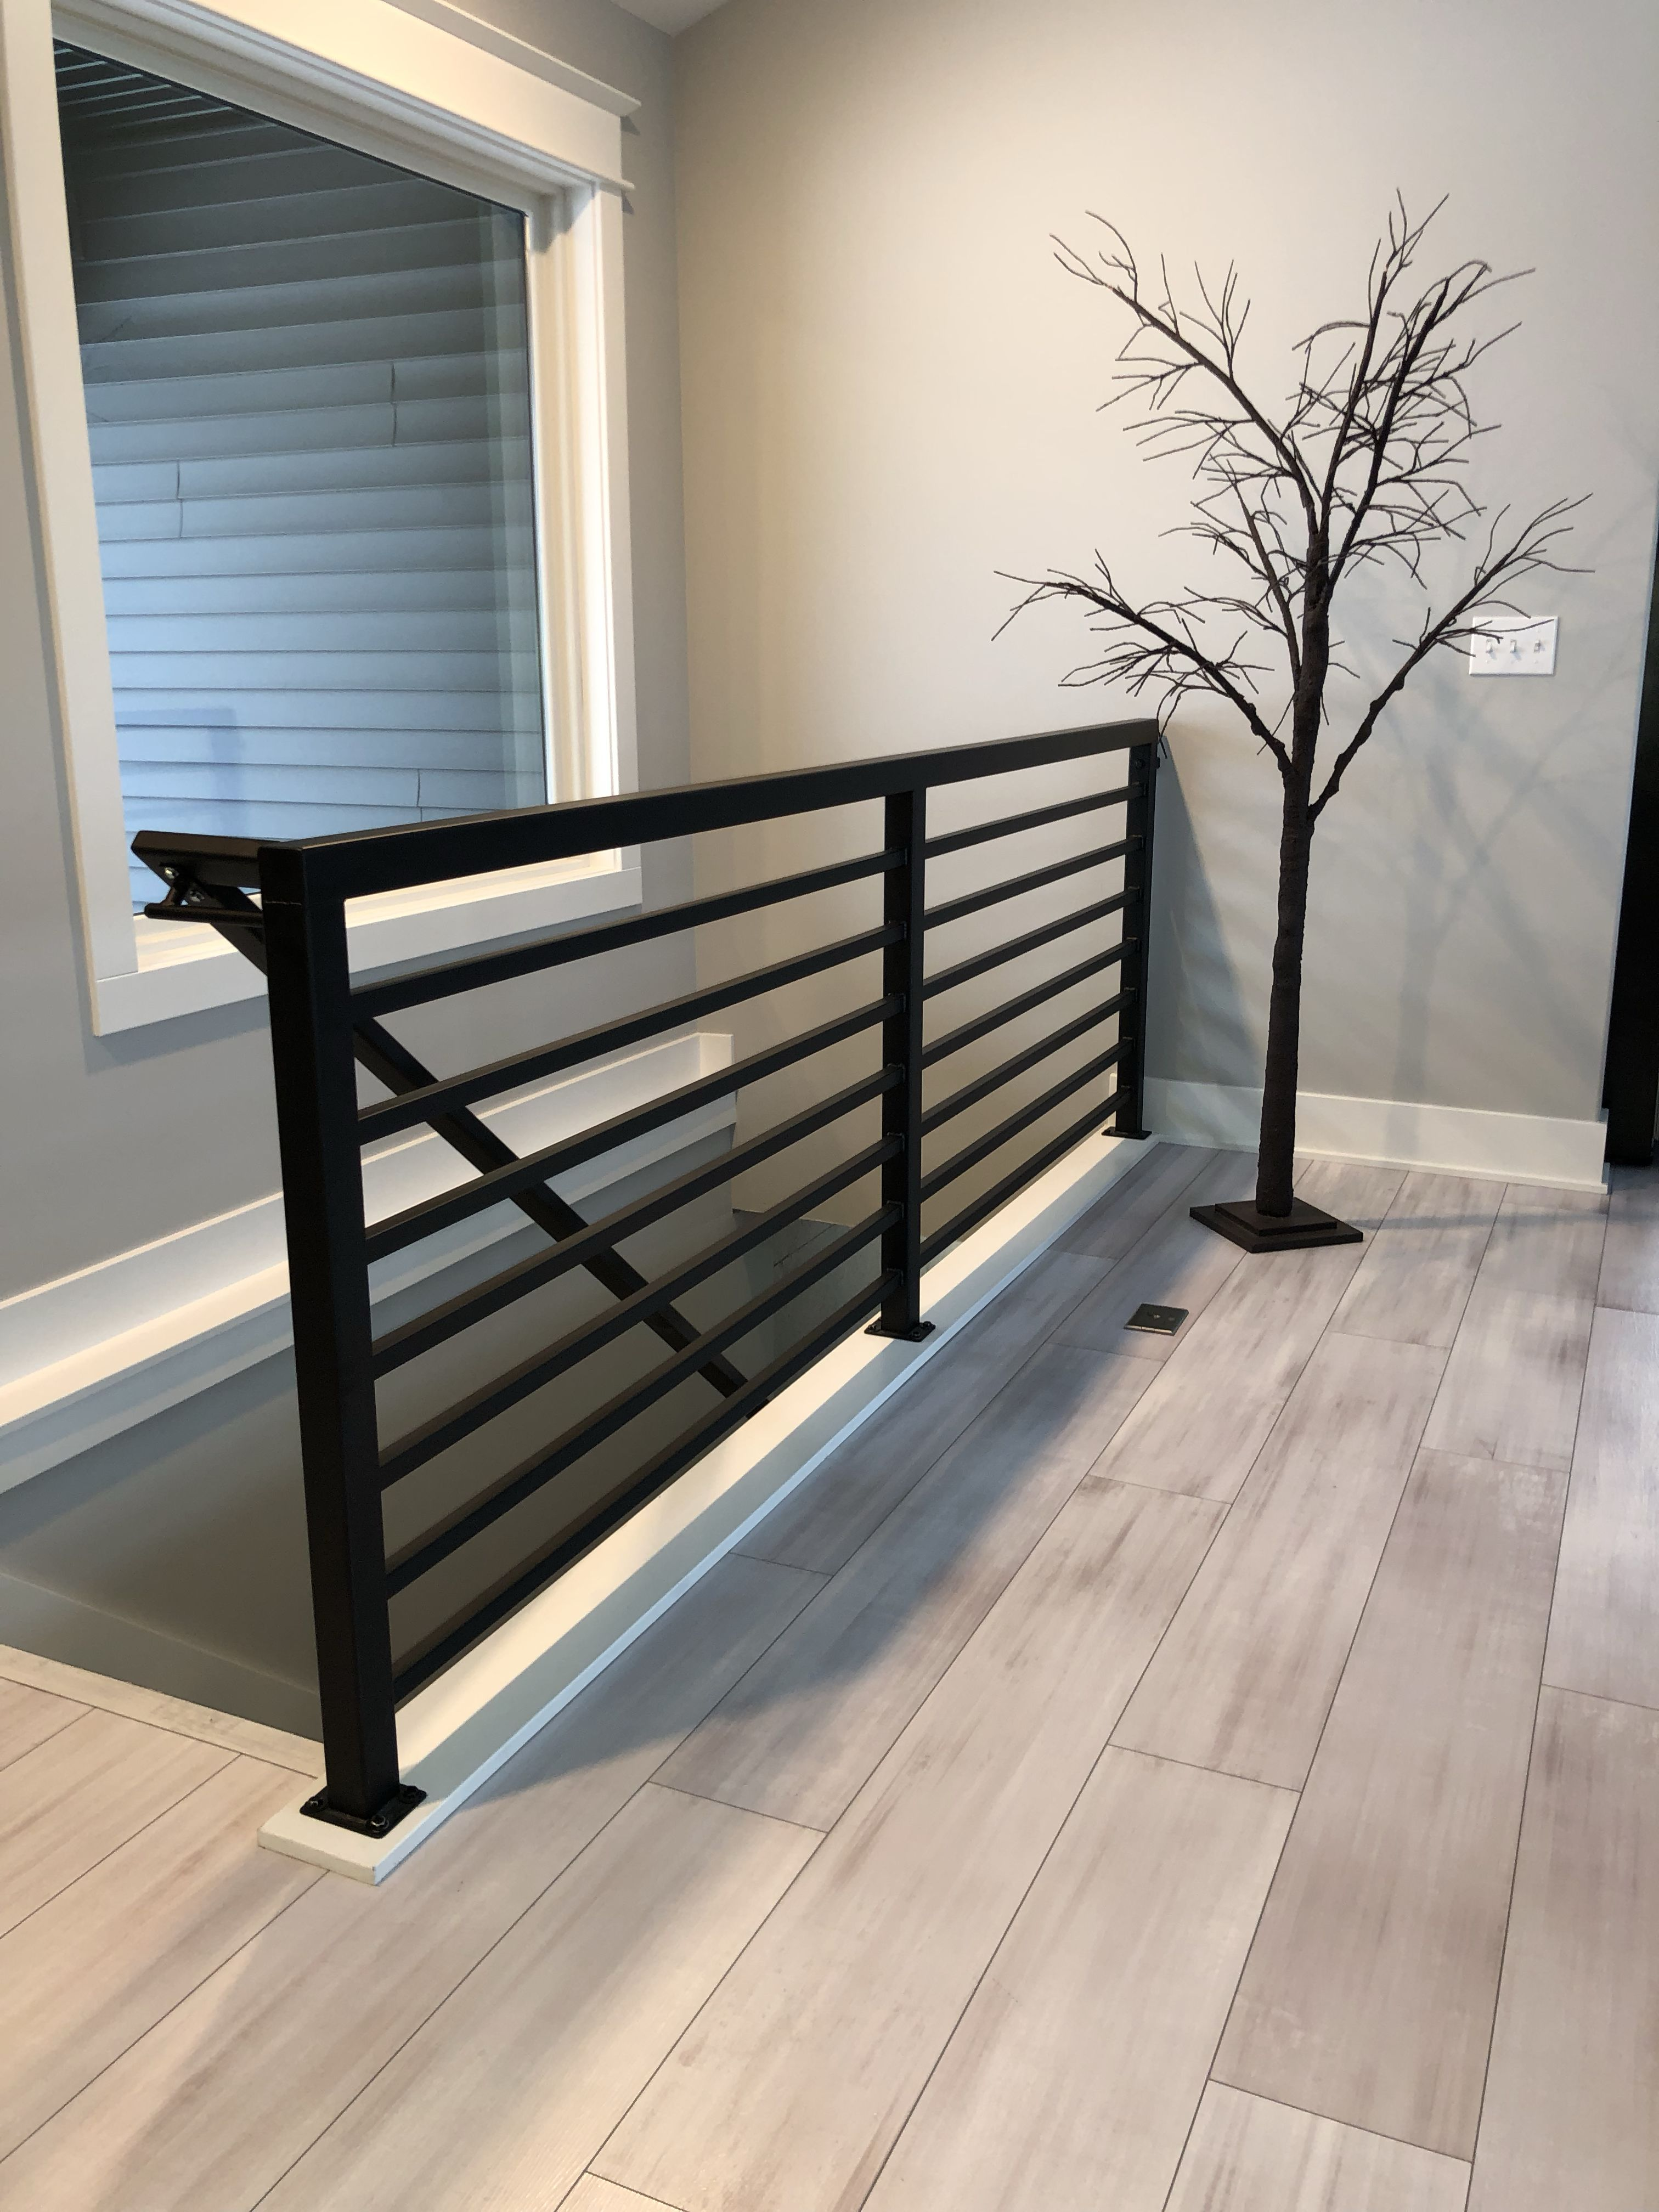 Best Beautiful Powder Coated Metal Stair Railing Stair Railing Metal Stair Railing Metal Stairs 400 x 300